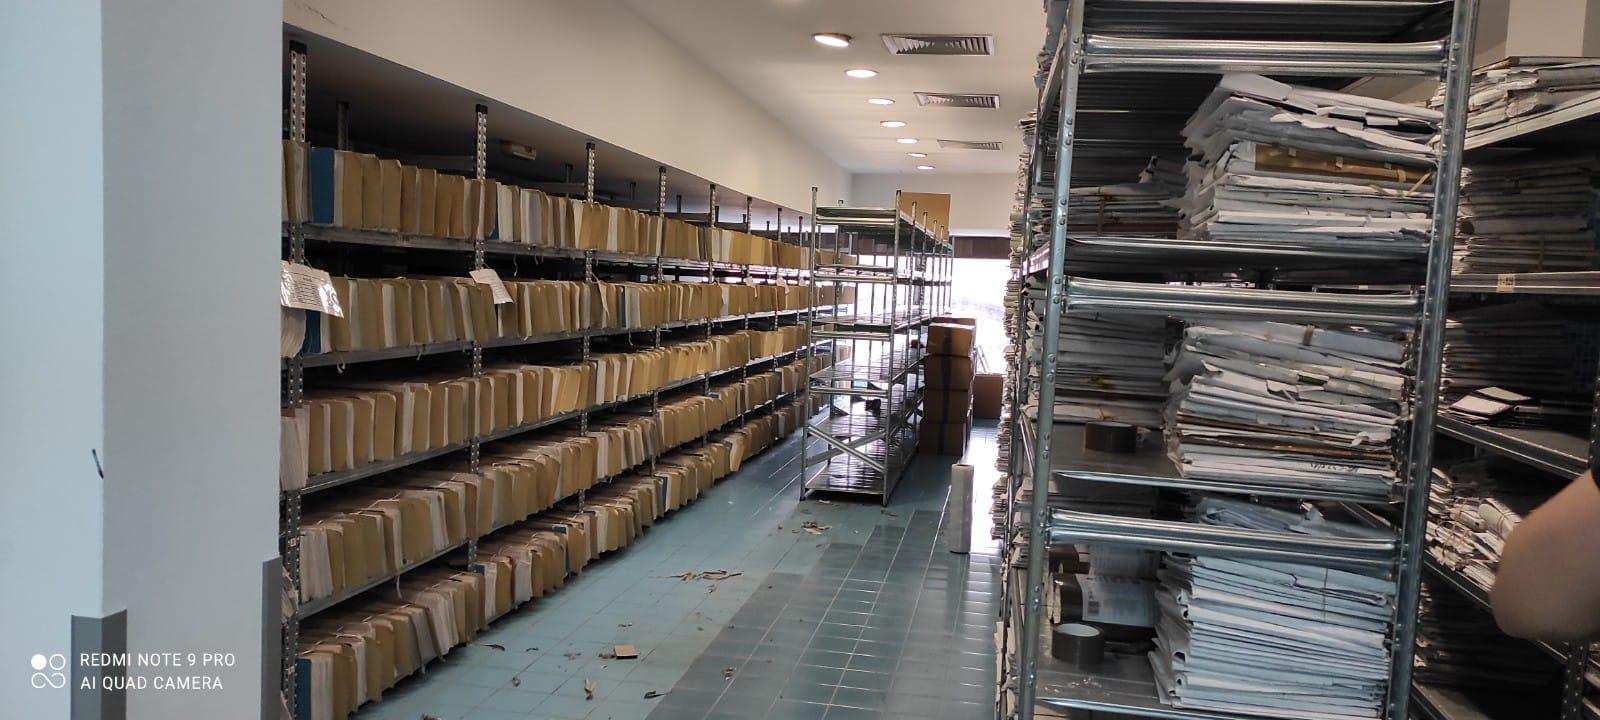 Selidba arhive